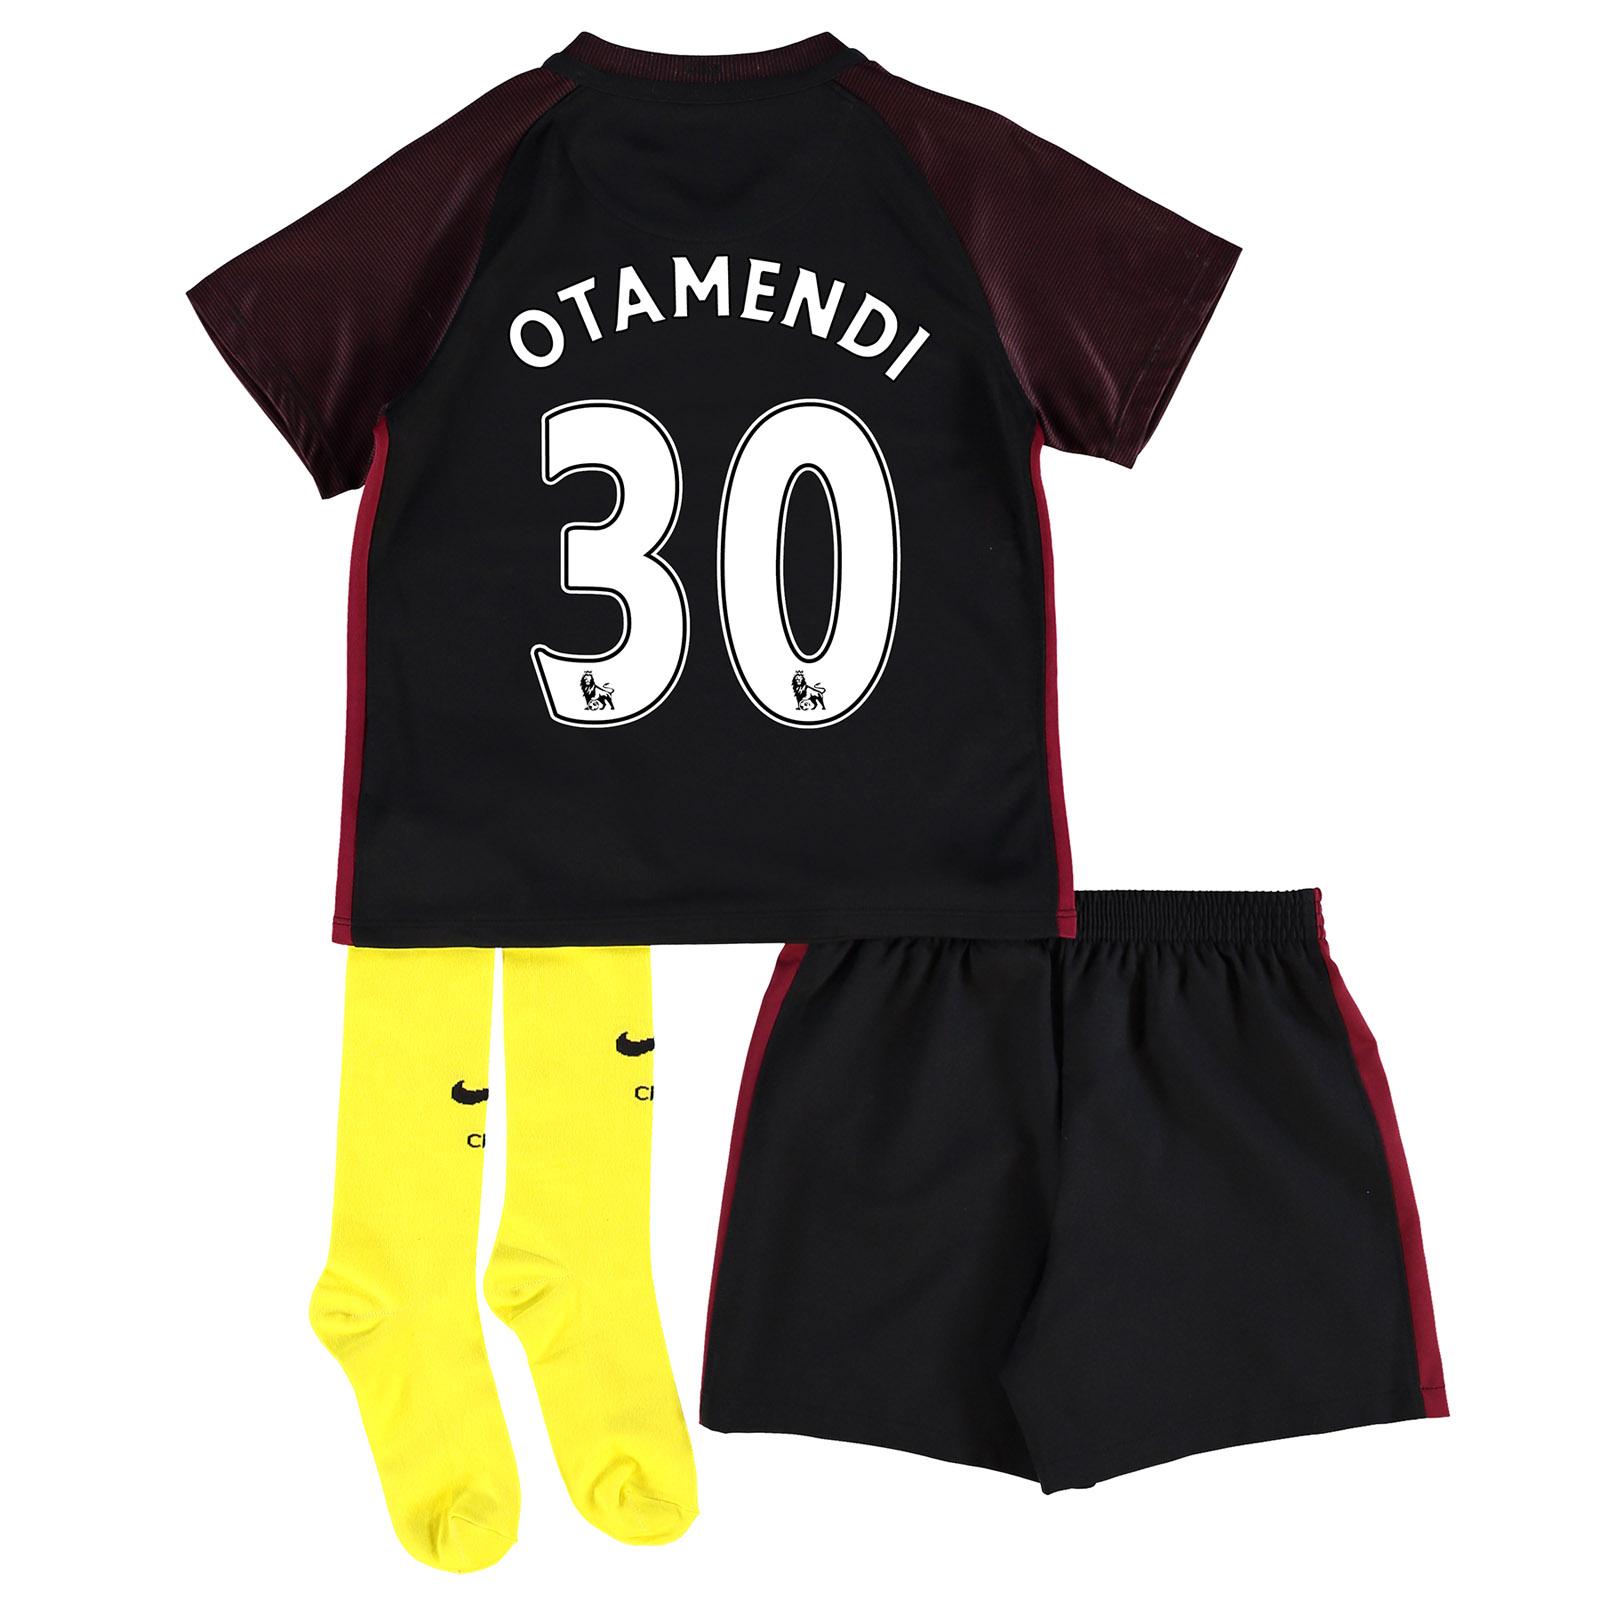 Manchester City Away Stadium Kit 2016-17 - Little Kids with Otamendi 3